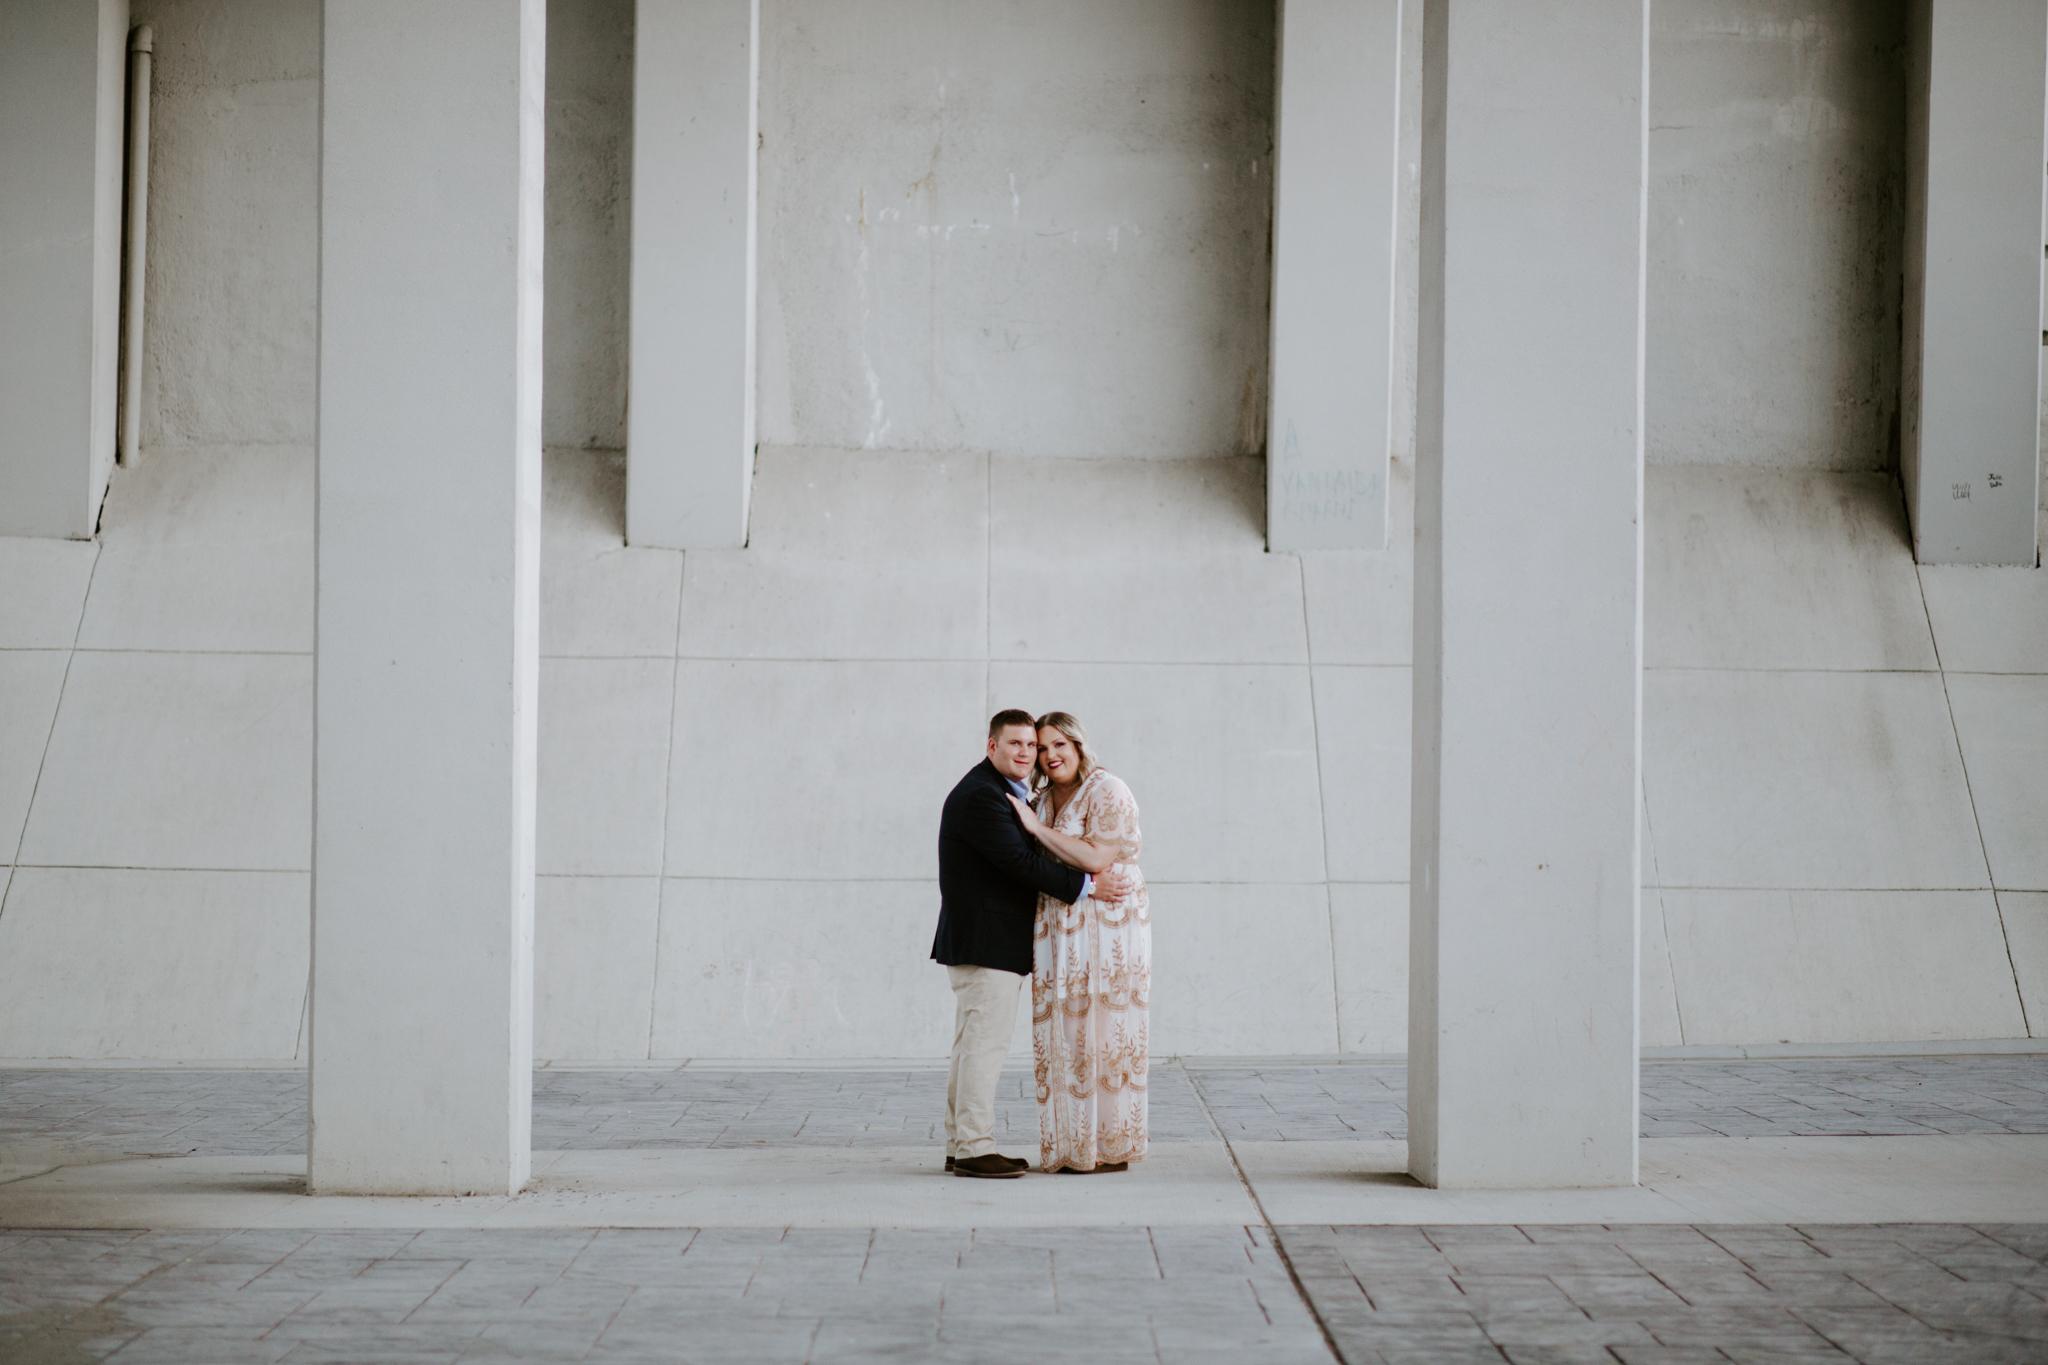 Ryley + Dalton + Chattanooga + Nashville + Knoxville+ Wedding + Engagement + Photographer-35.jpg